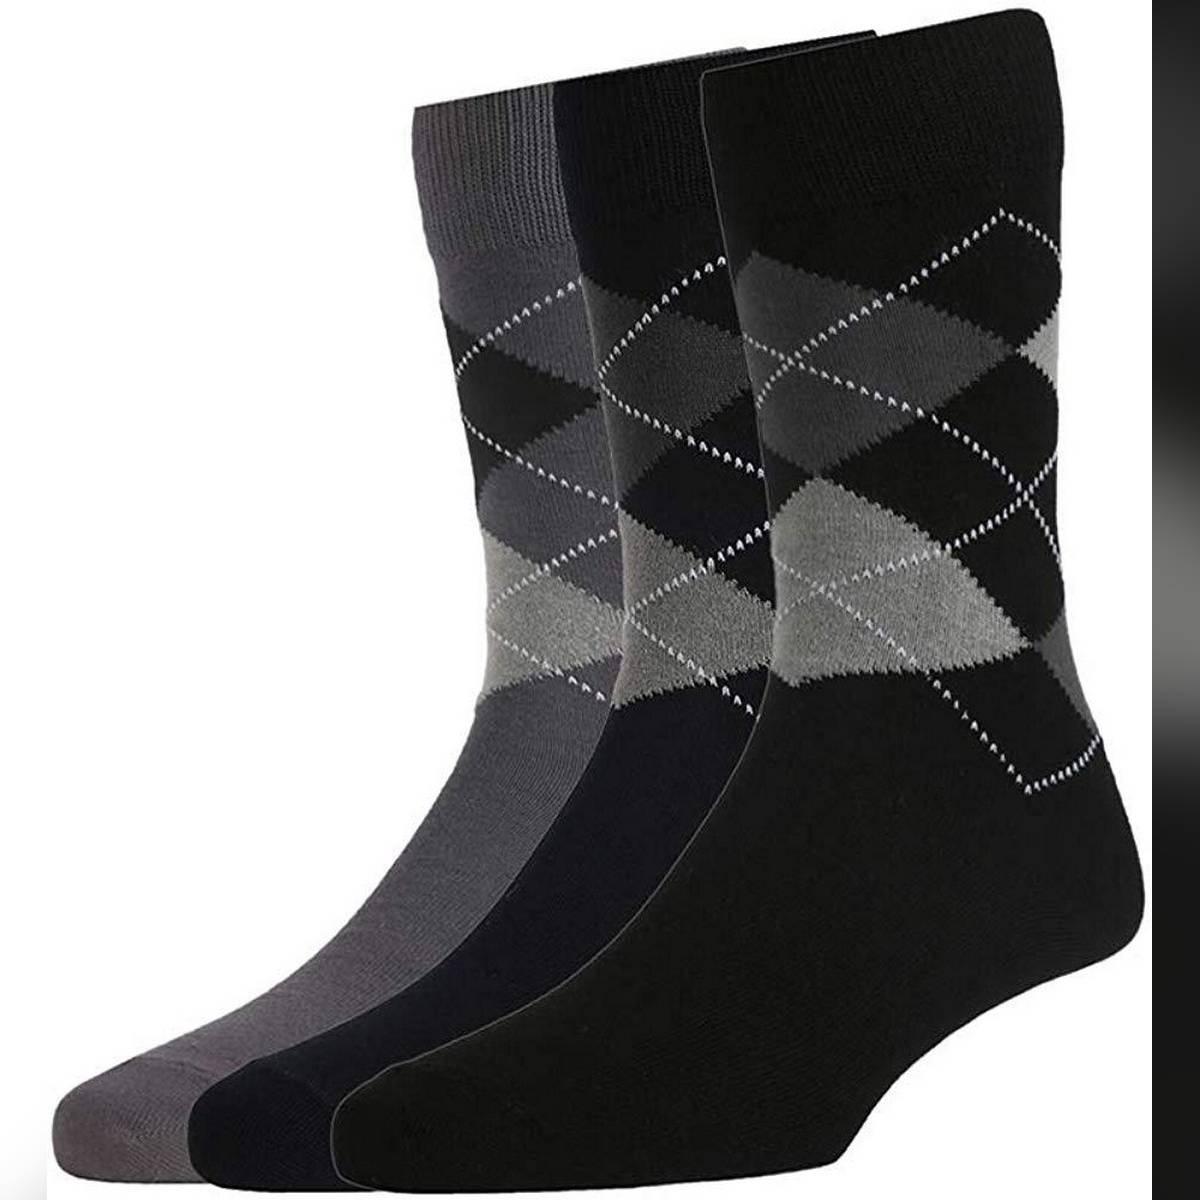 Men's Cotton Full Length Socks (Black and Grey, Free Size) Pack of 3